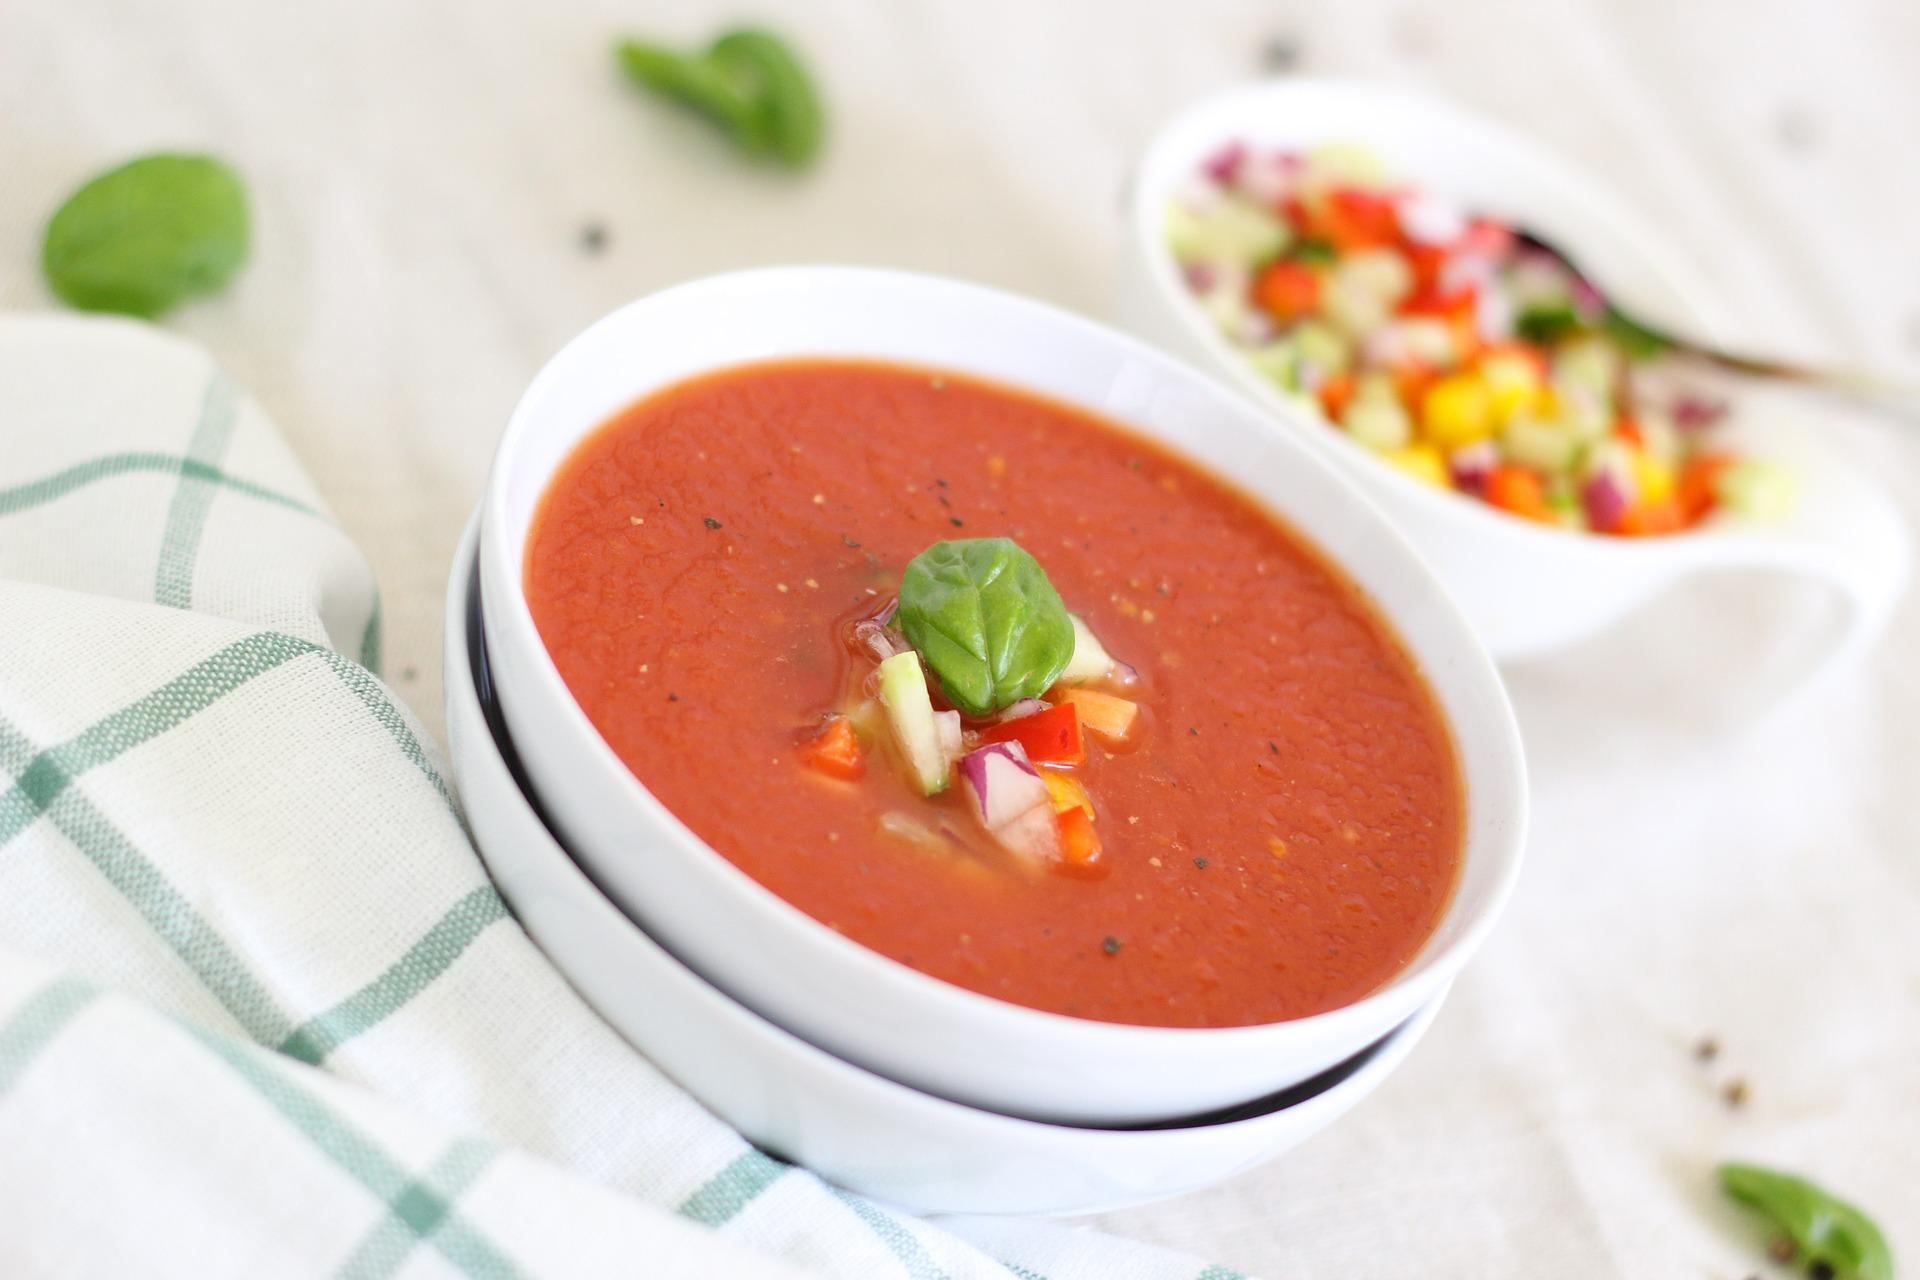 суп томатный Bernadette Wurzinger с сайта Pixabay